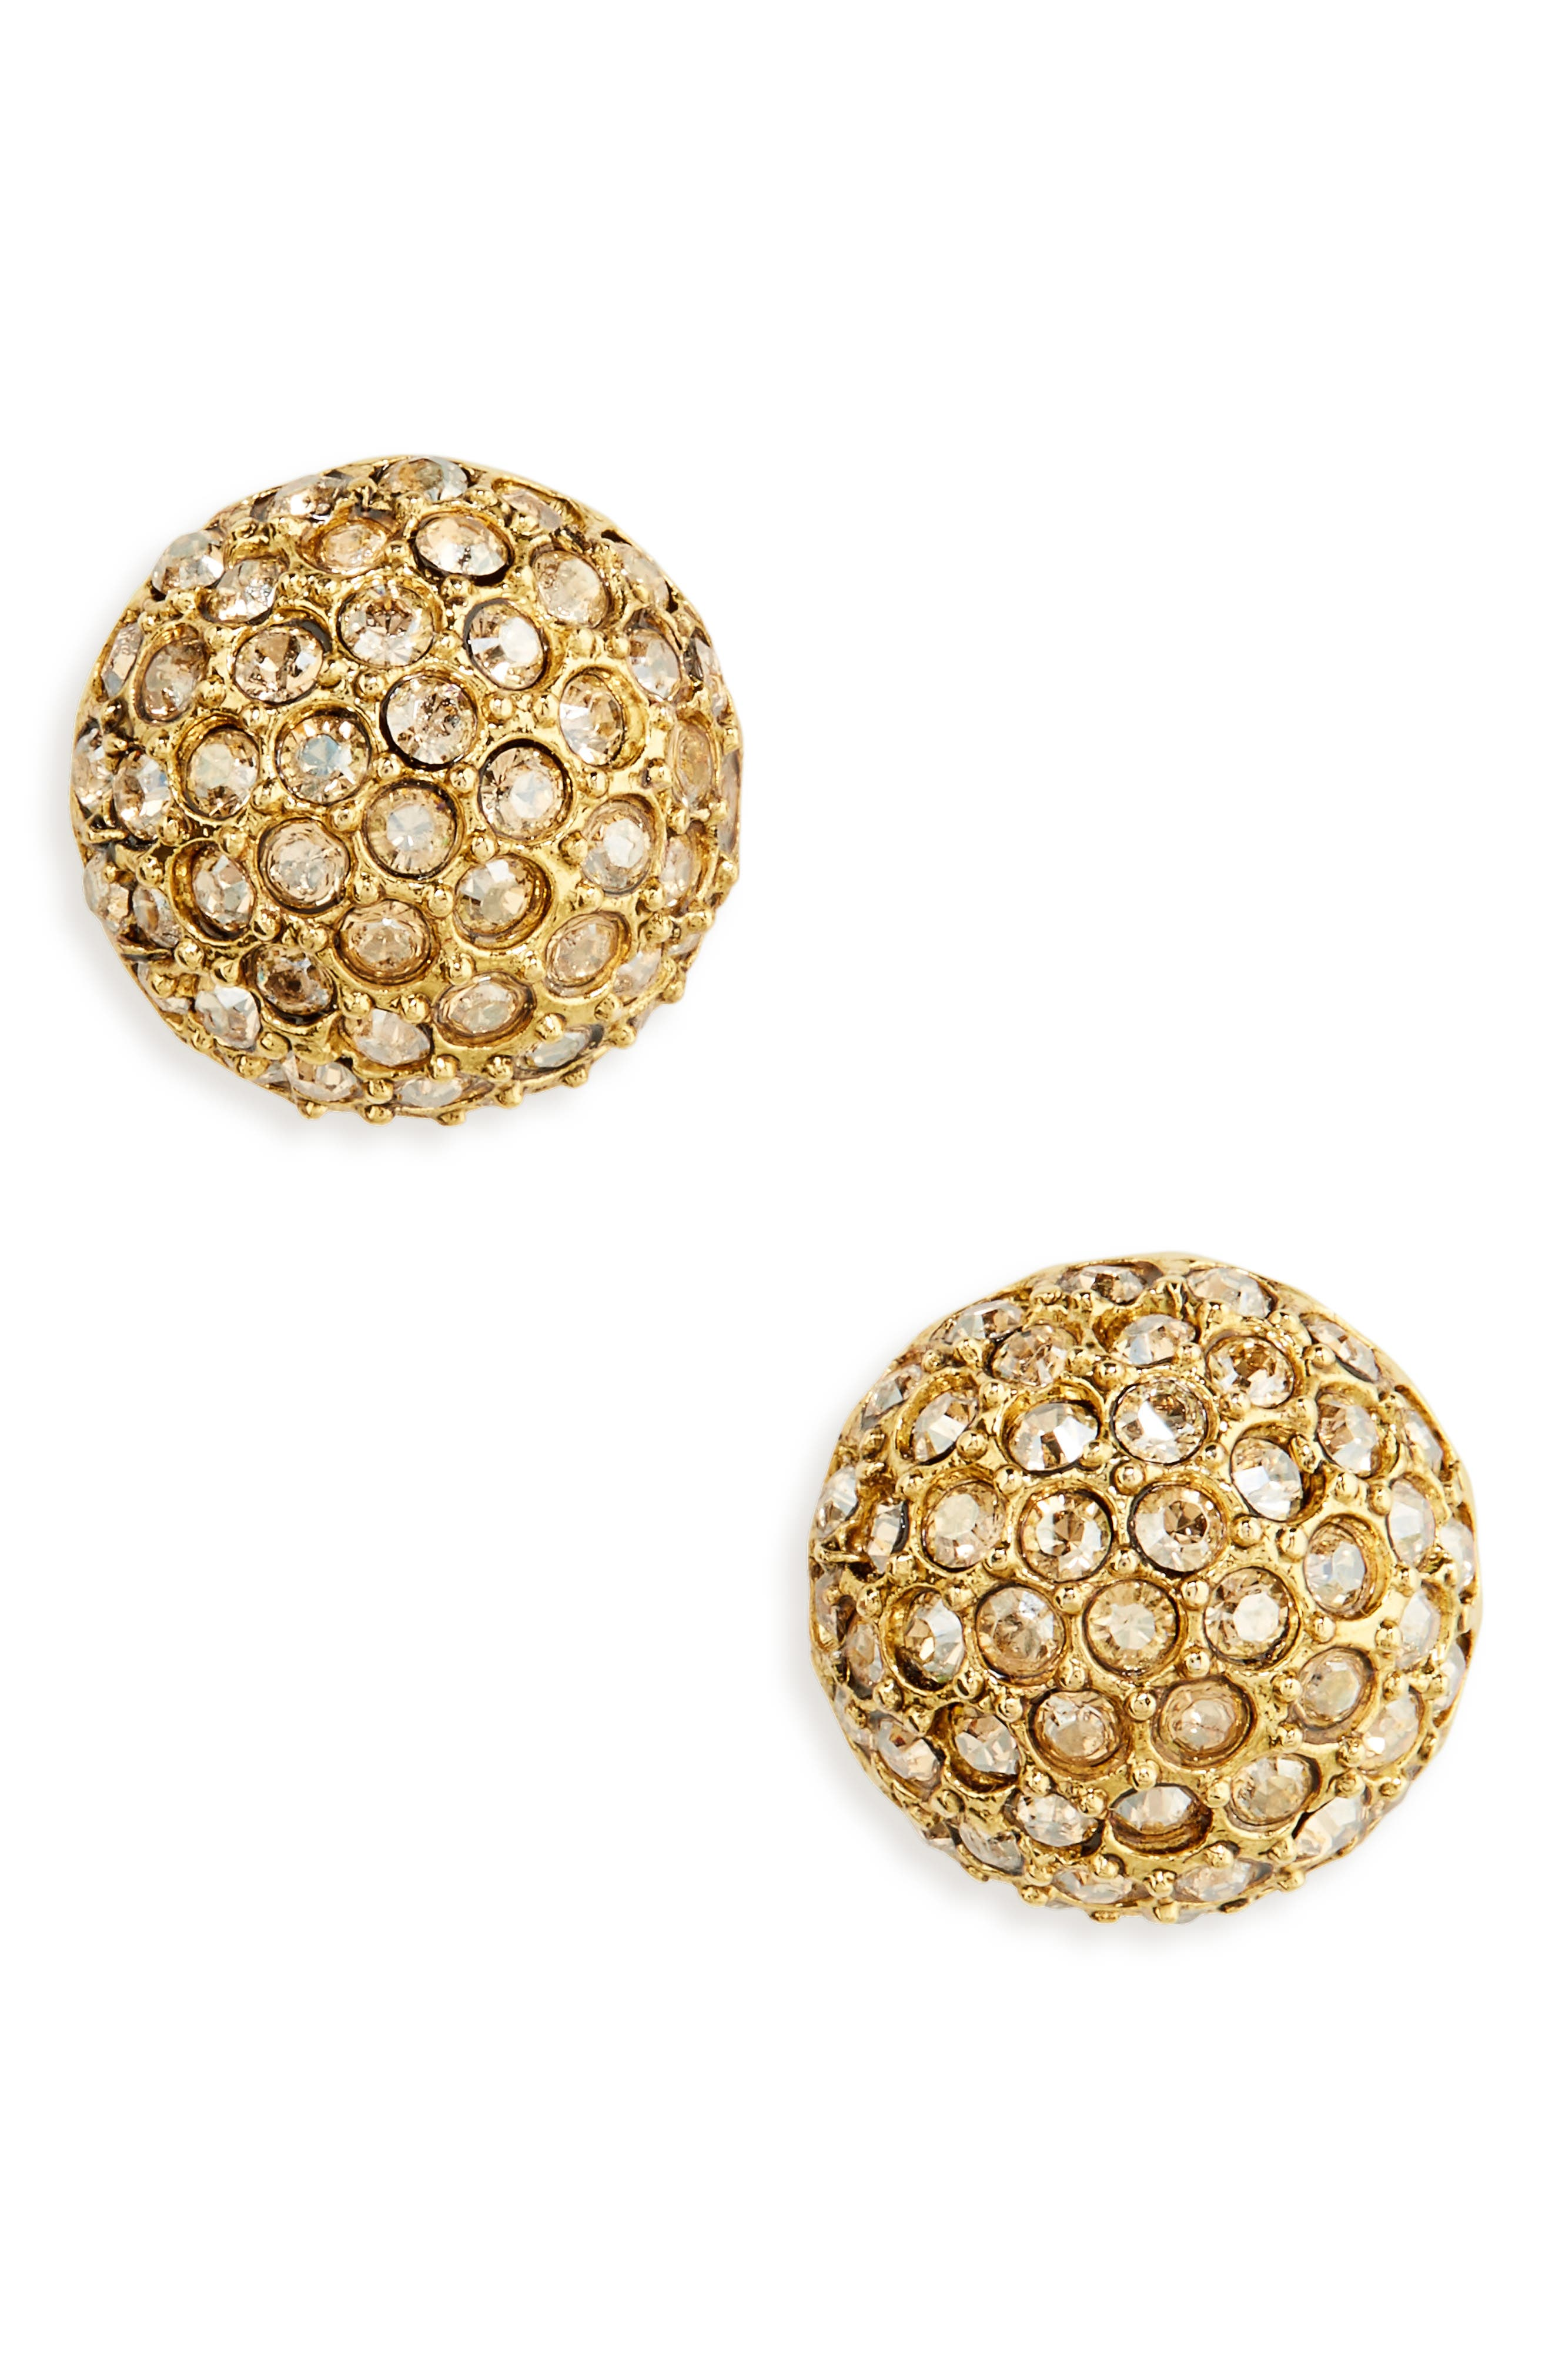 Main Image - Oscar de la Renta Dome Stud Earrings